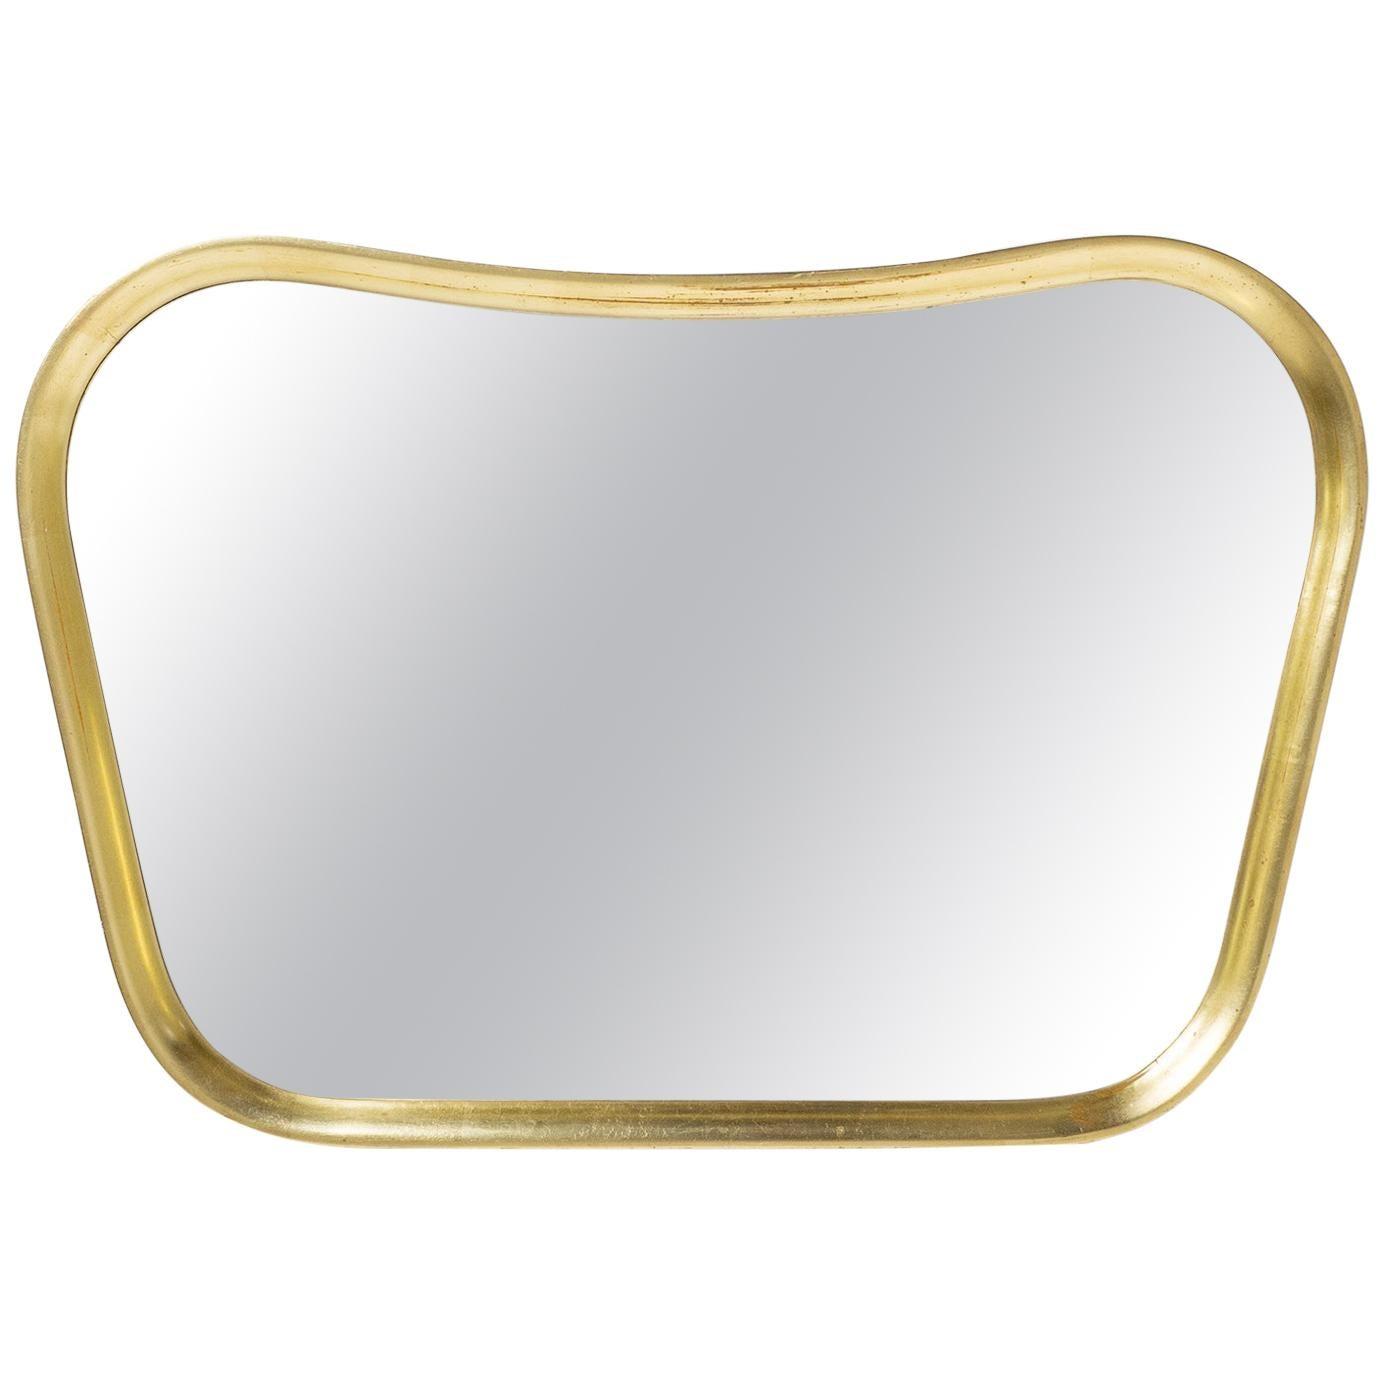 Austrian Giltwood Mirror, 1940s